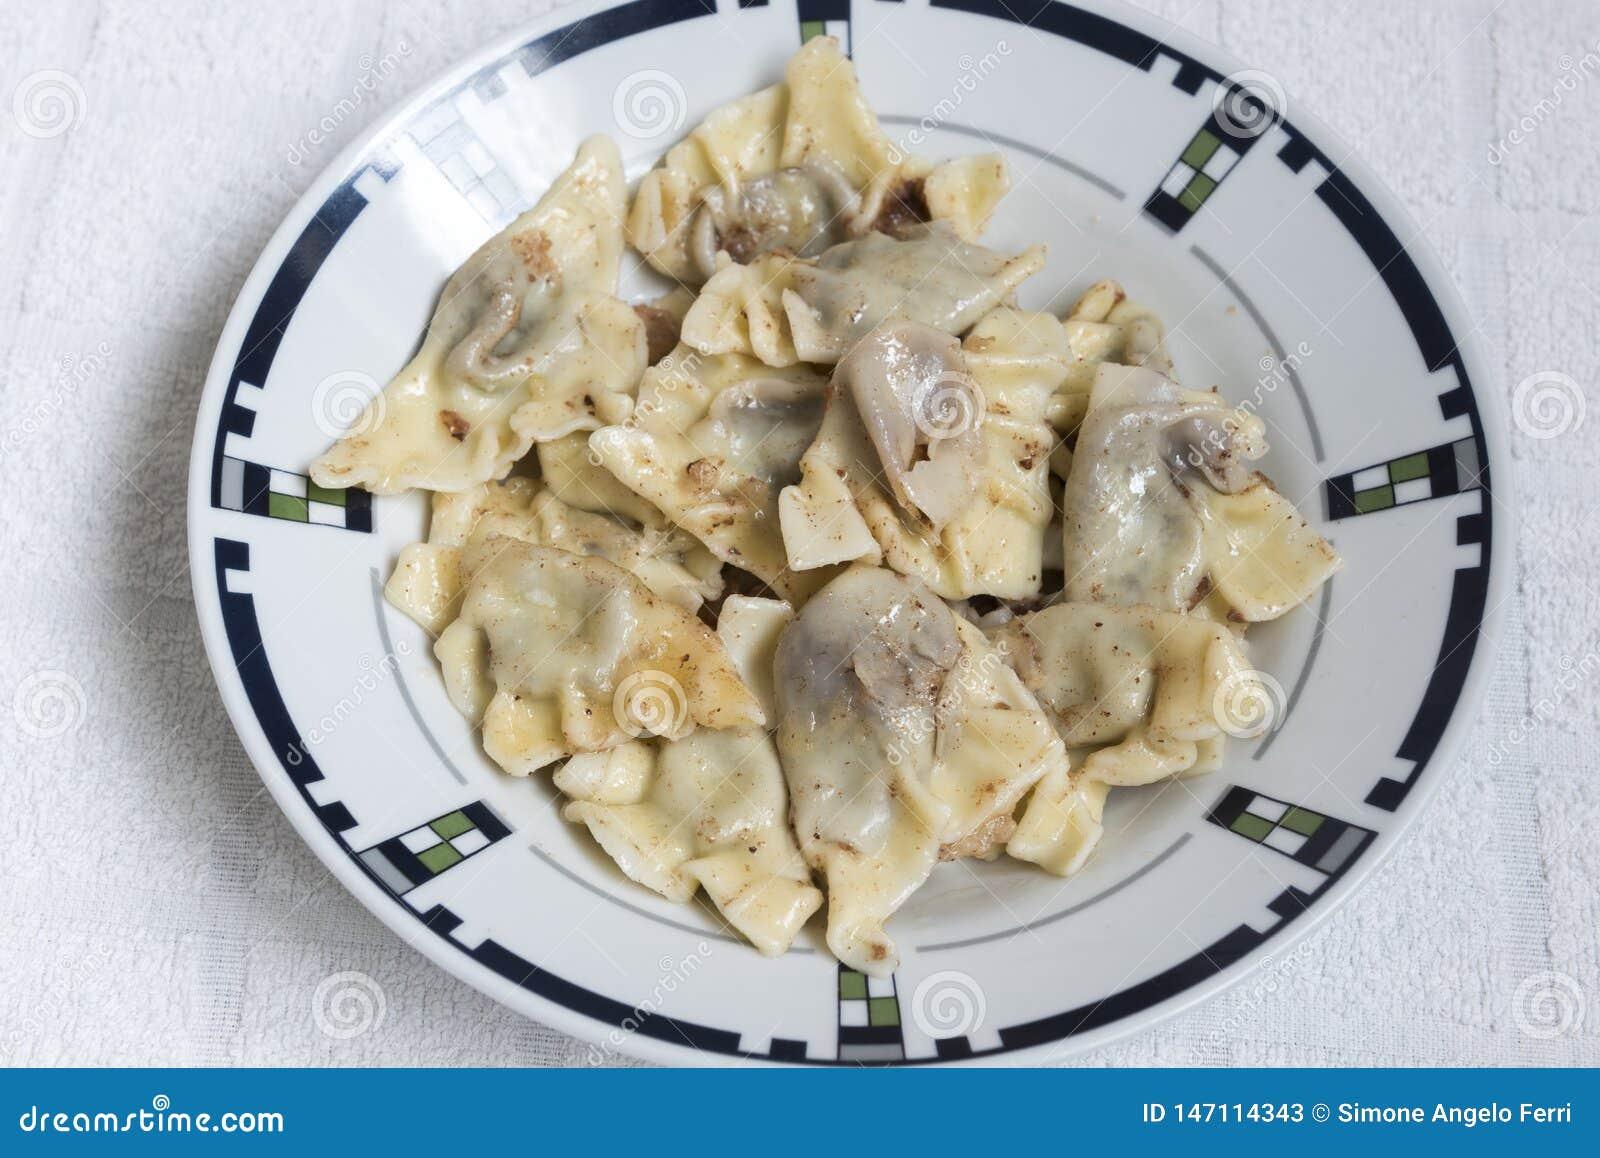 Steamed sweet dumplings, italian ravioli homemade food.